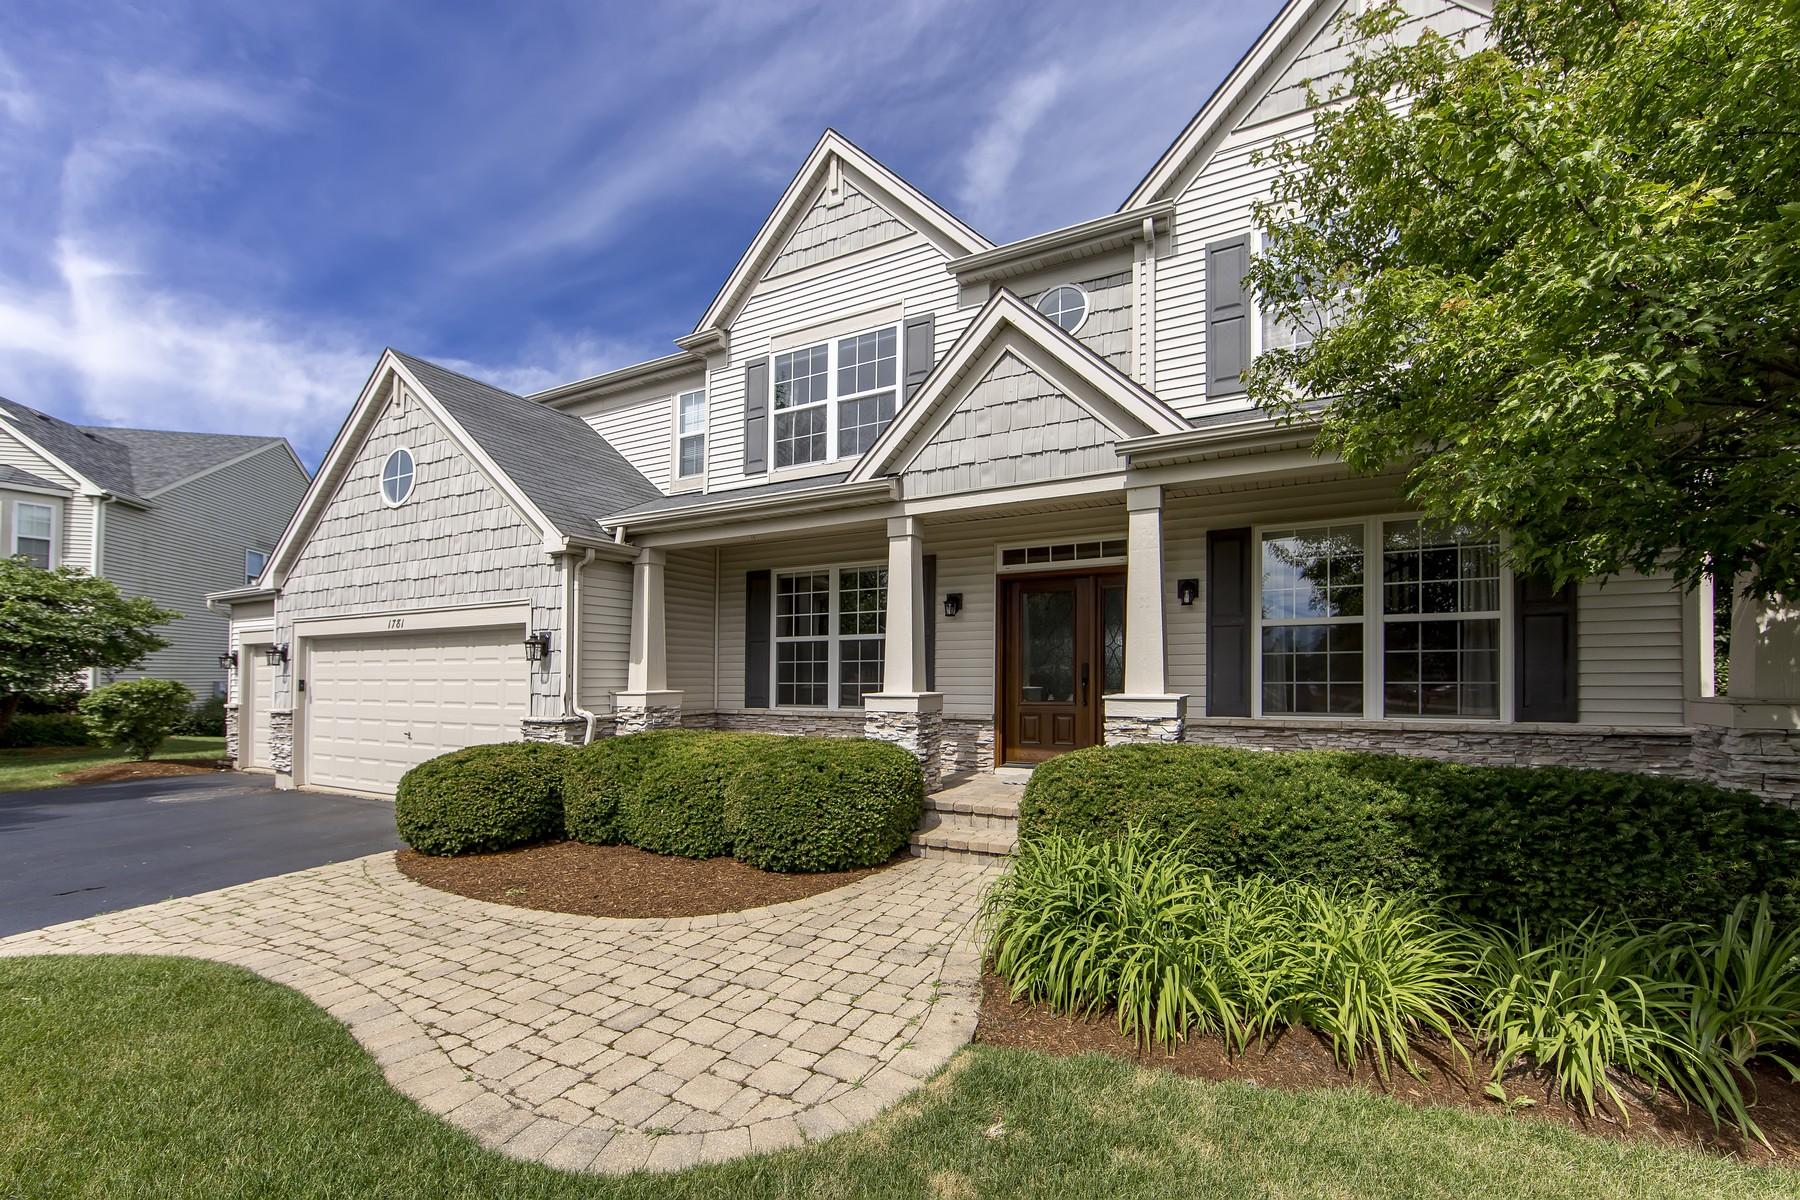 獨棟家庭住宅 為 出售 在 Expanded Family Home 1781 Napa Suwe Court Wauconda, 伊利諾斯州, 60084 美國